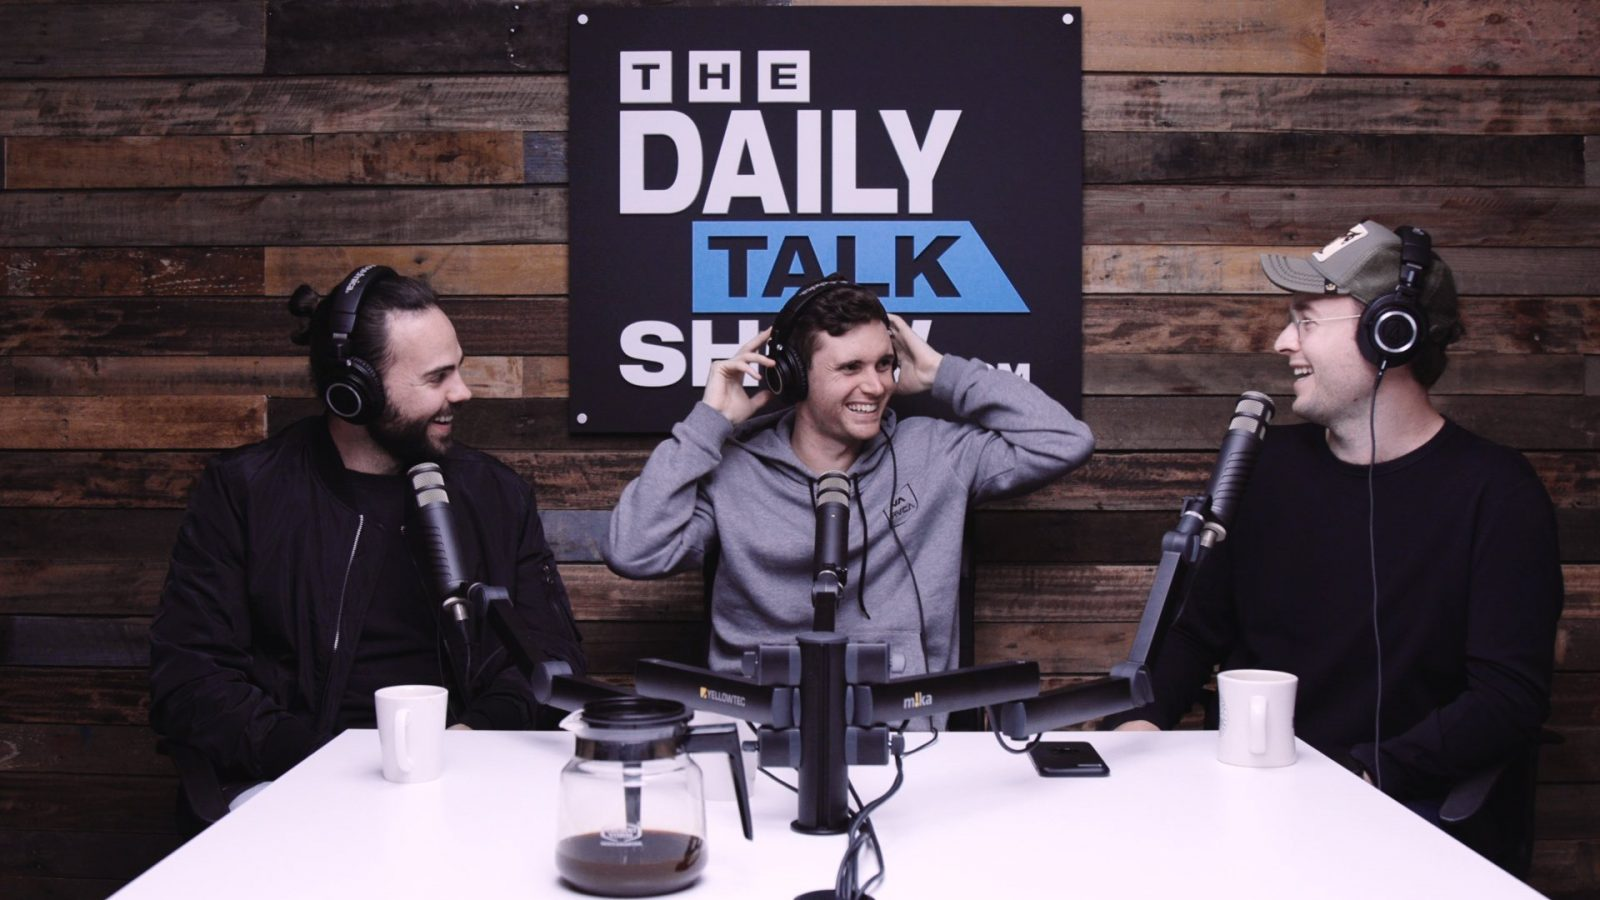 Luke-Kidgell-The-Daily-Talk-Show